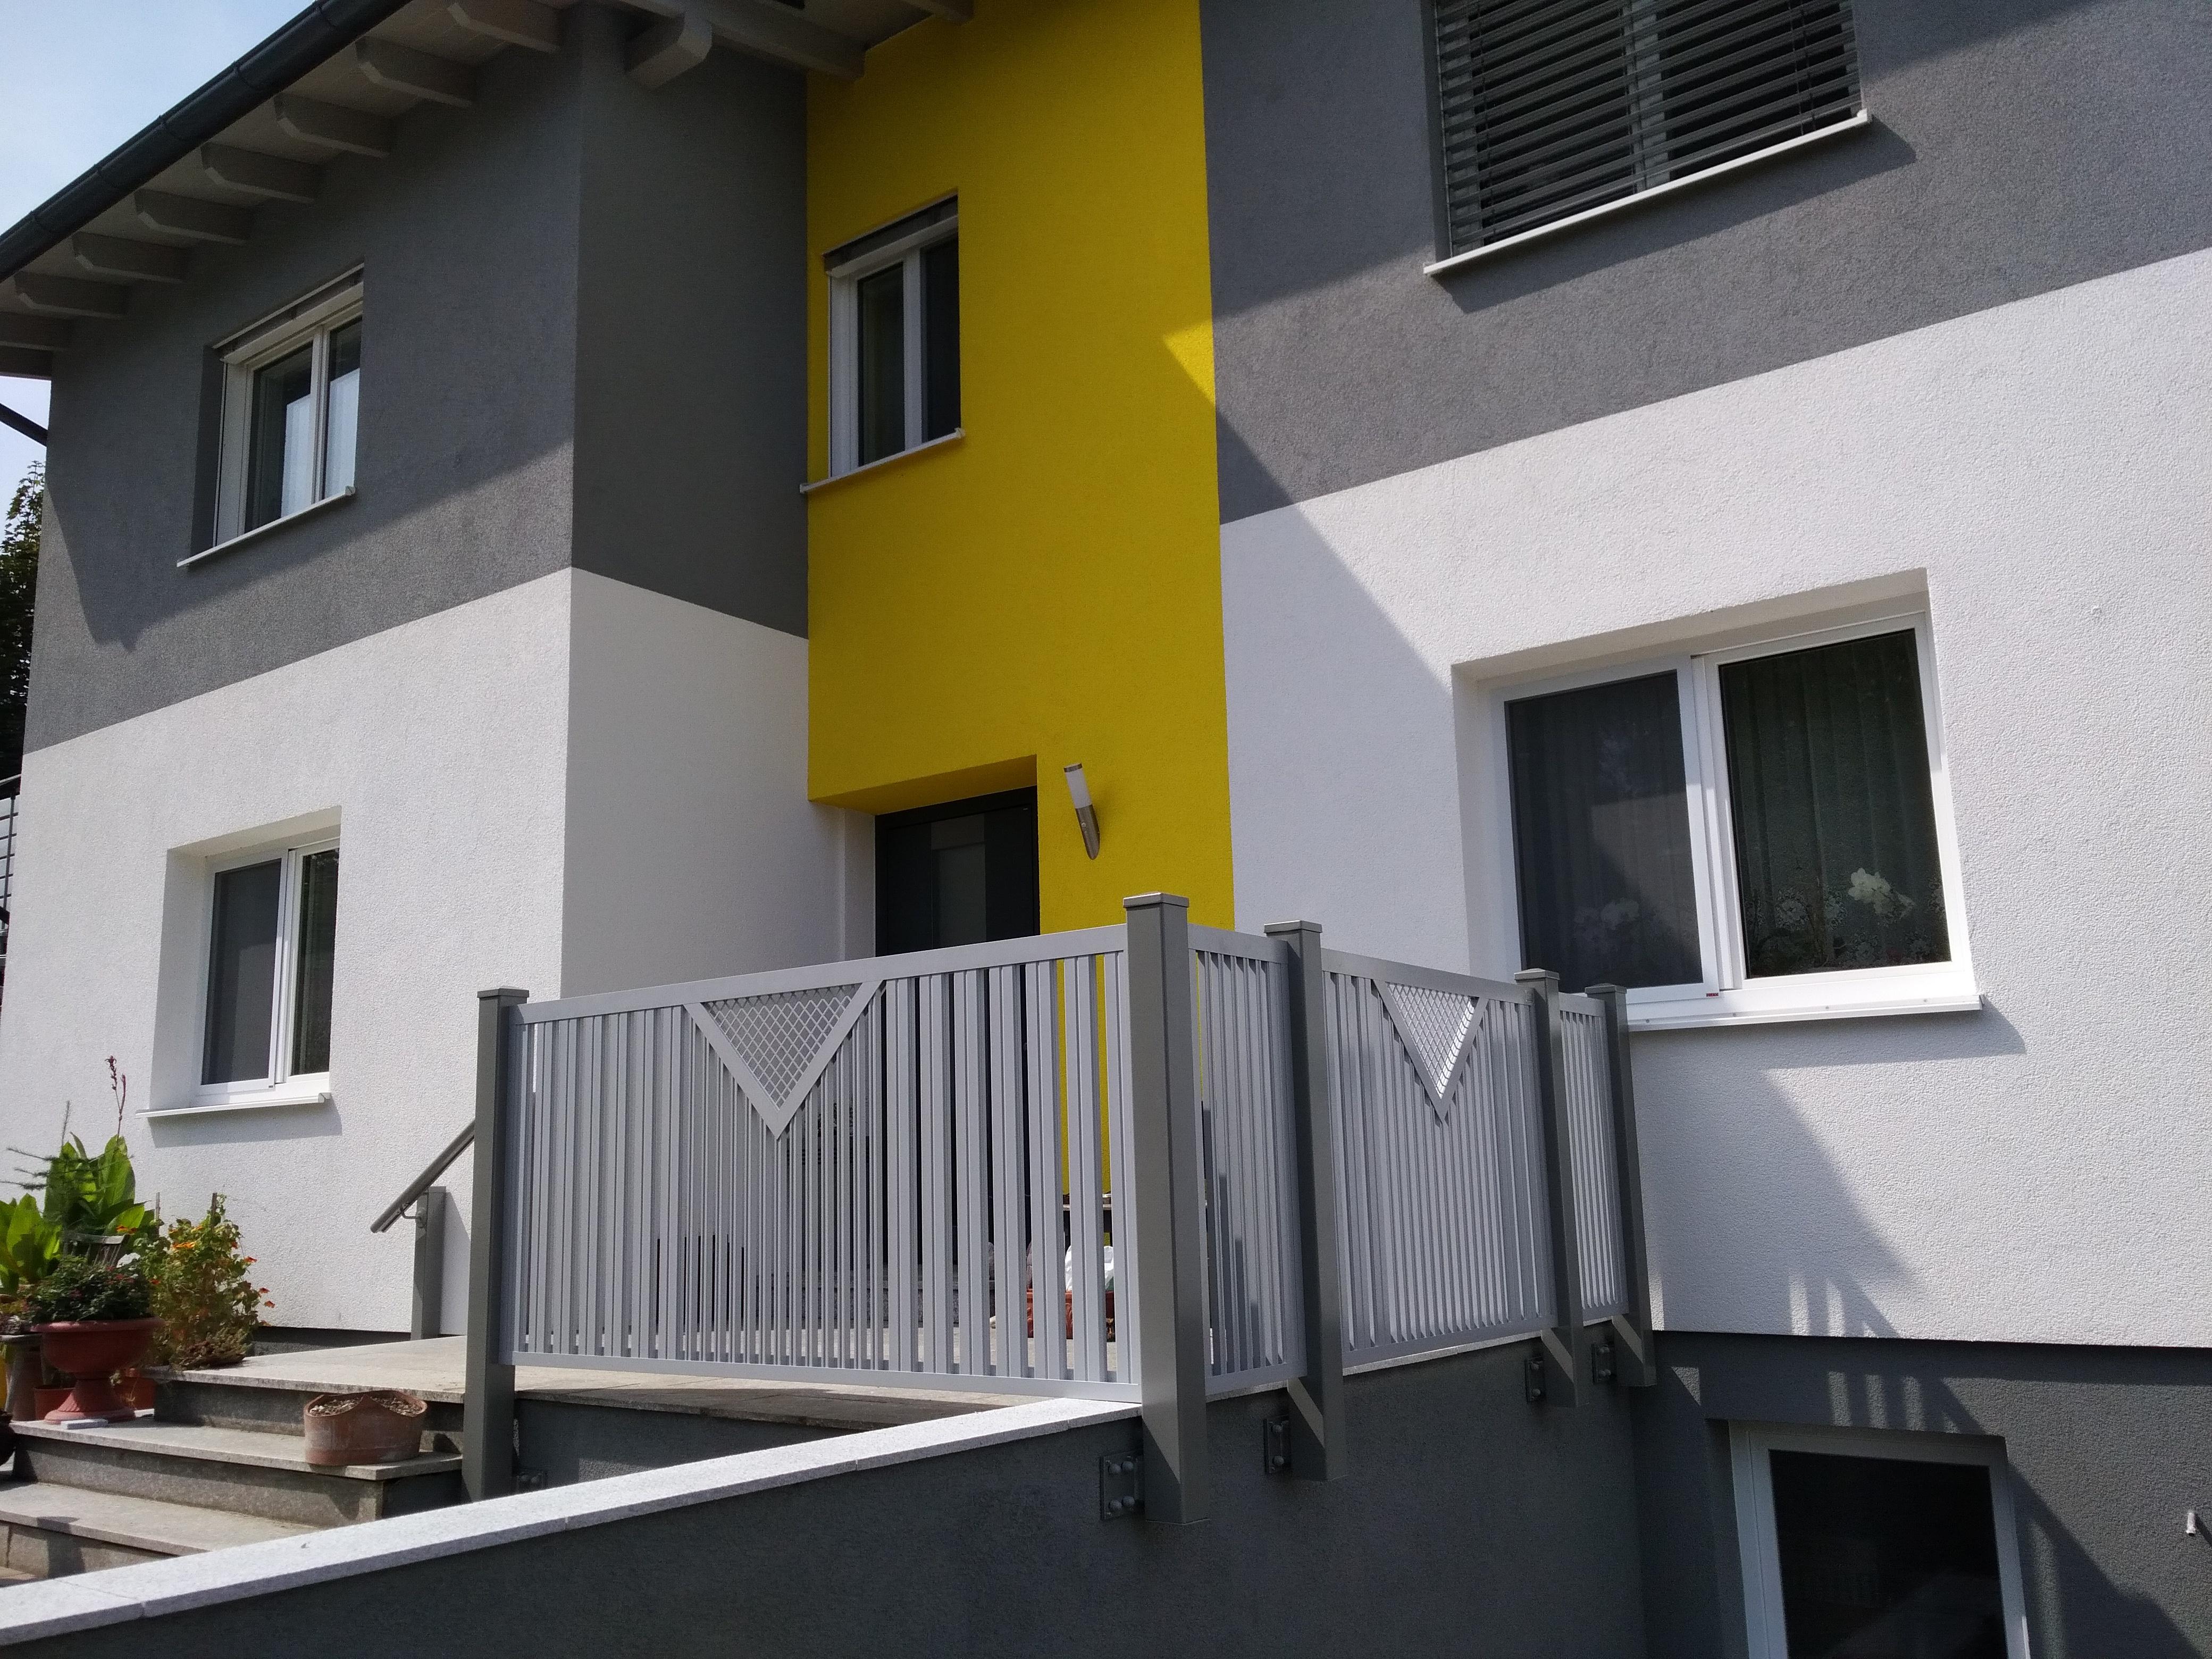 https://0501.nccdn.net/4_2/000/000/071/260/Aluminium-Balkon-Kitzb--hl-4160x3120.jpg